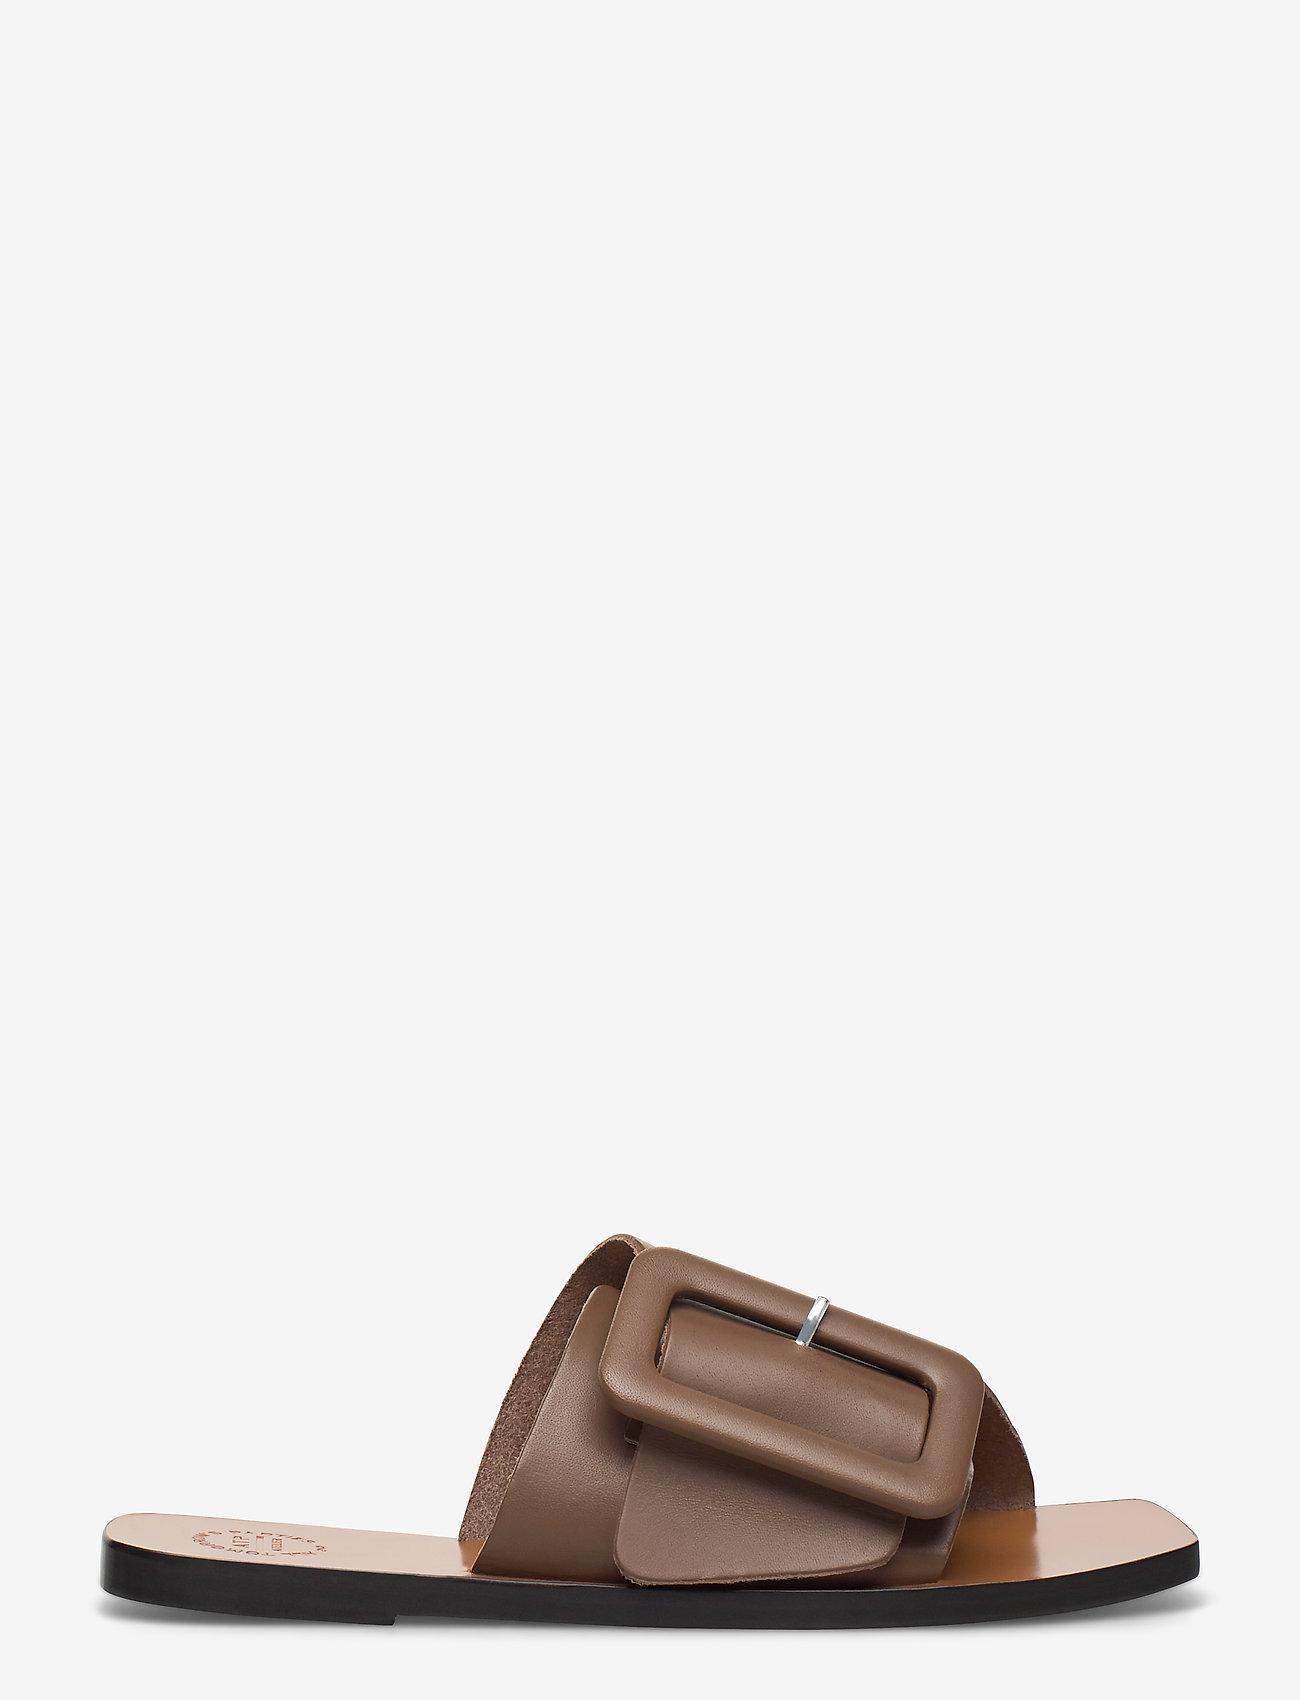 ATP Atelier - Ceci Khaki Brown Vacchetta - płaskie sandały - khaki brown - 1